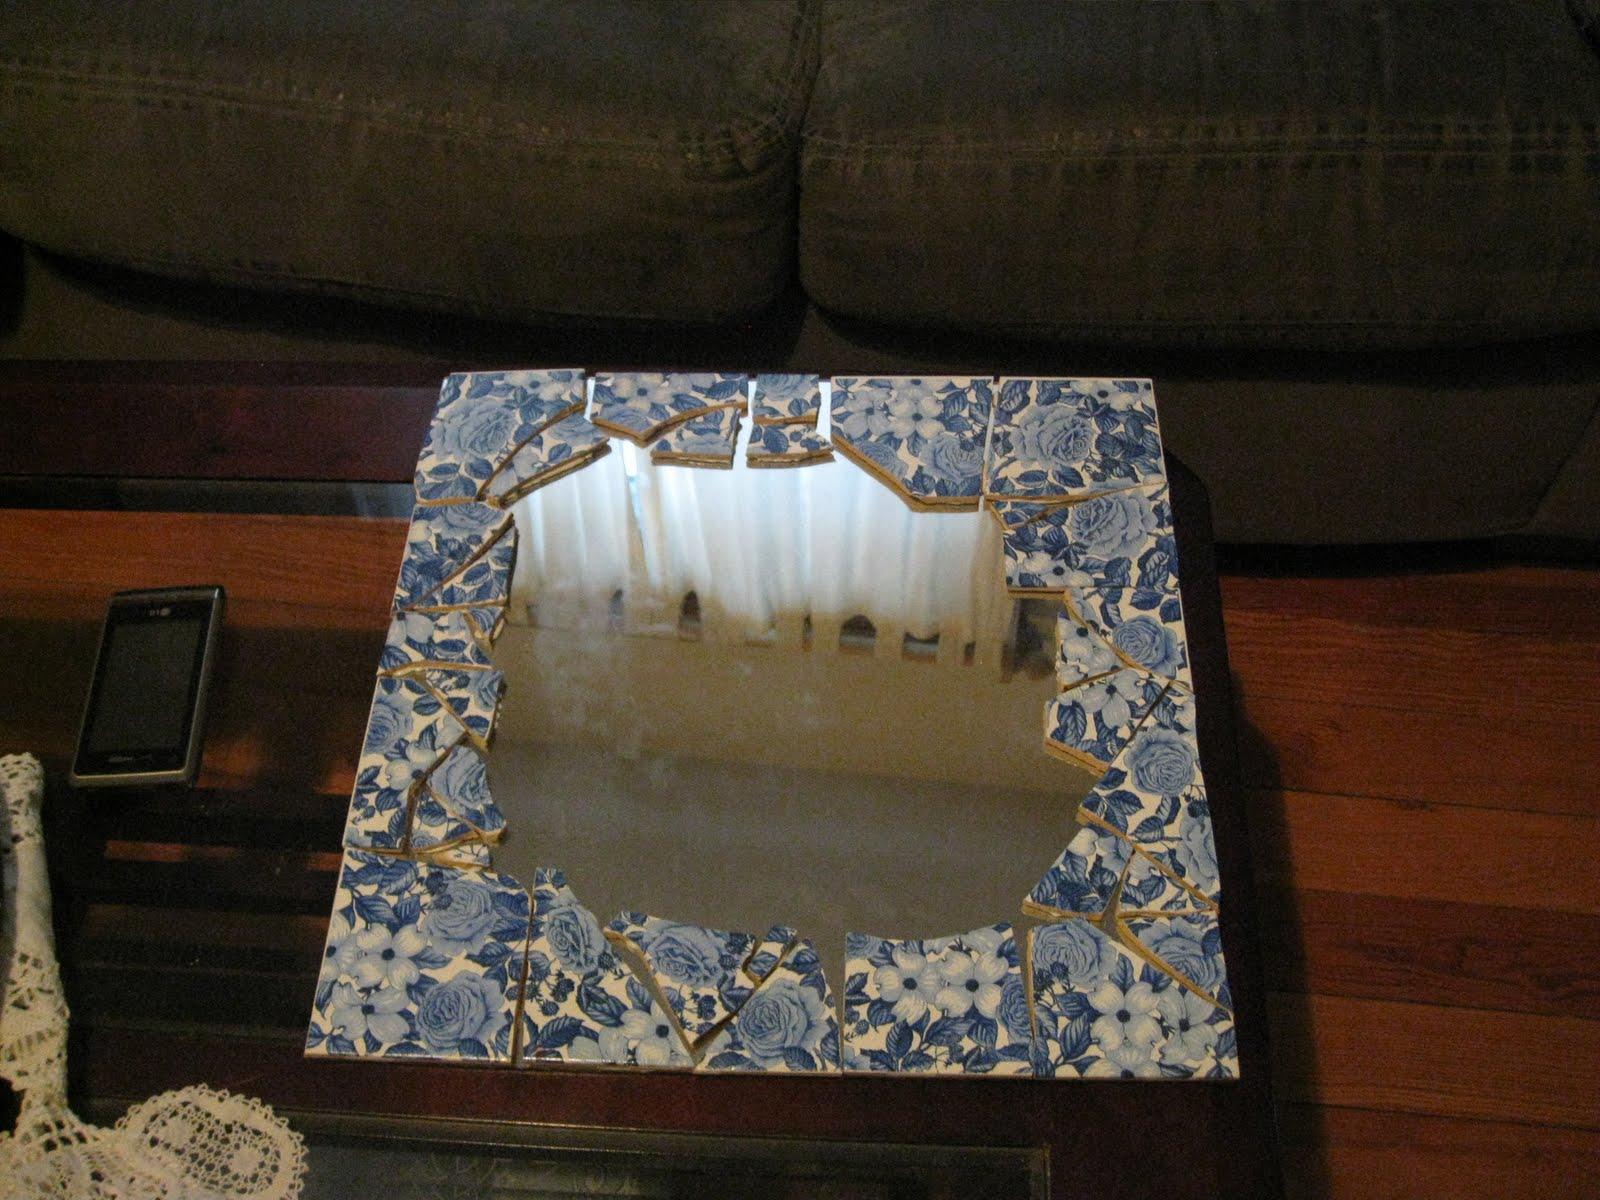 Diy Mosaic Tile Bathroom Mirror: Weekend Charm: DIY Mosaic Tile On A Mirror